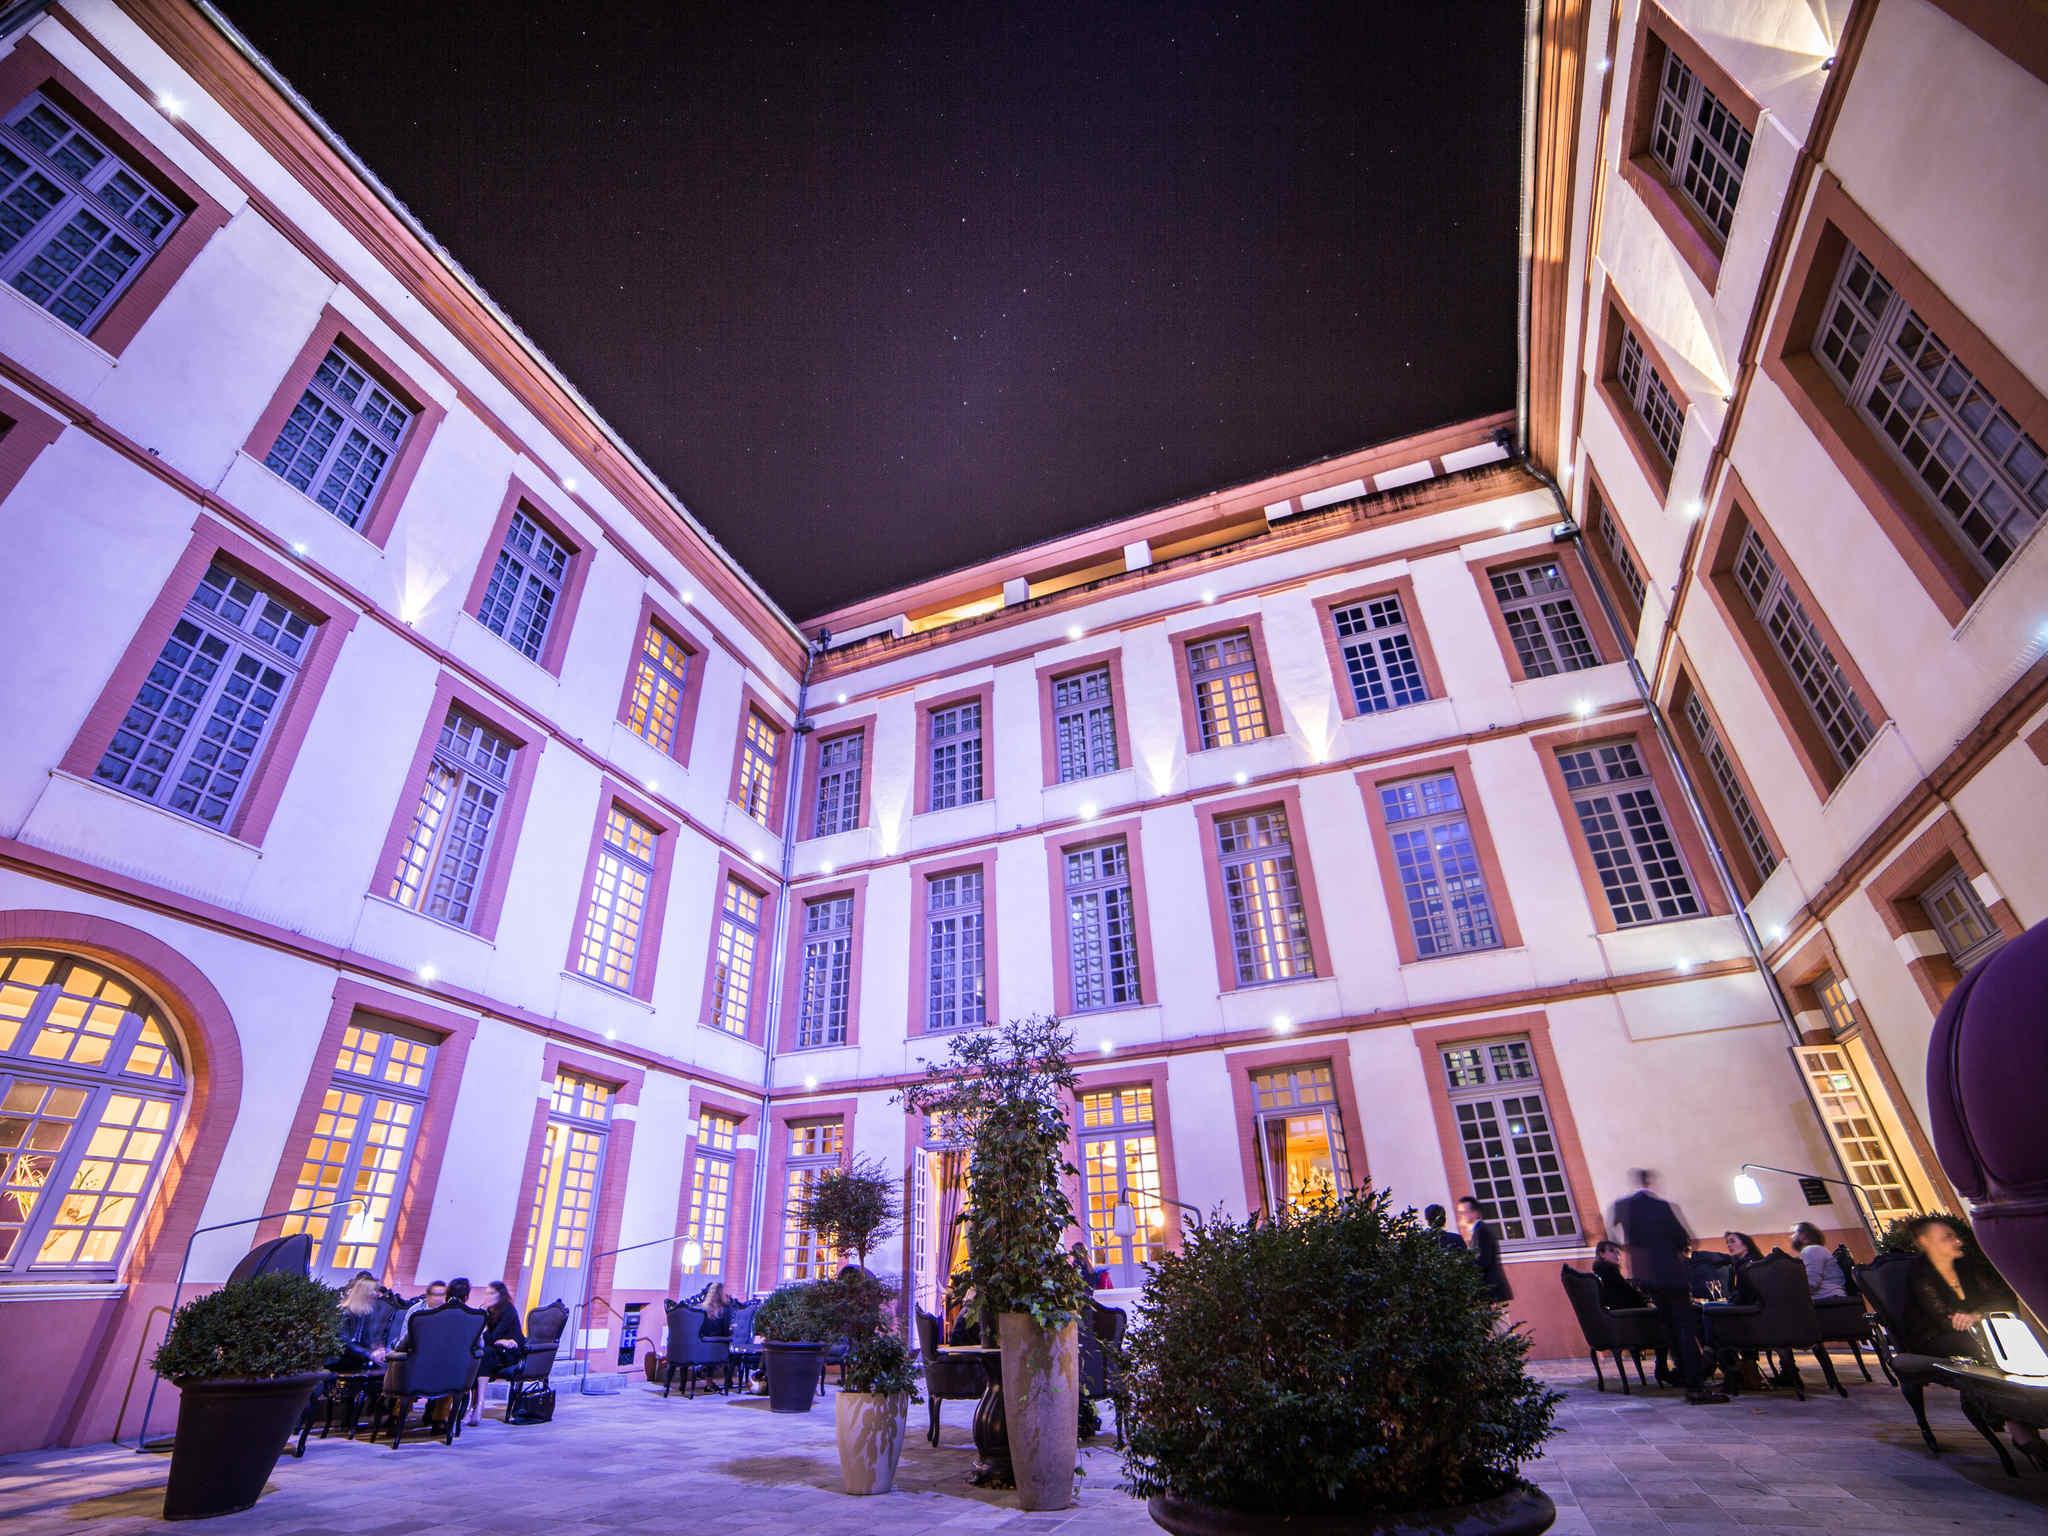 فندق - La Cour des Consuls Hôtel & Spa Toulouse - MGallery by Sofitel